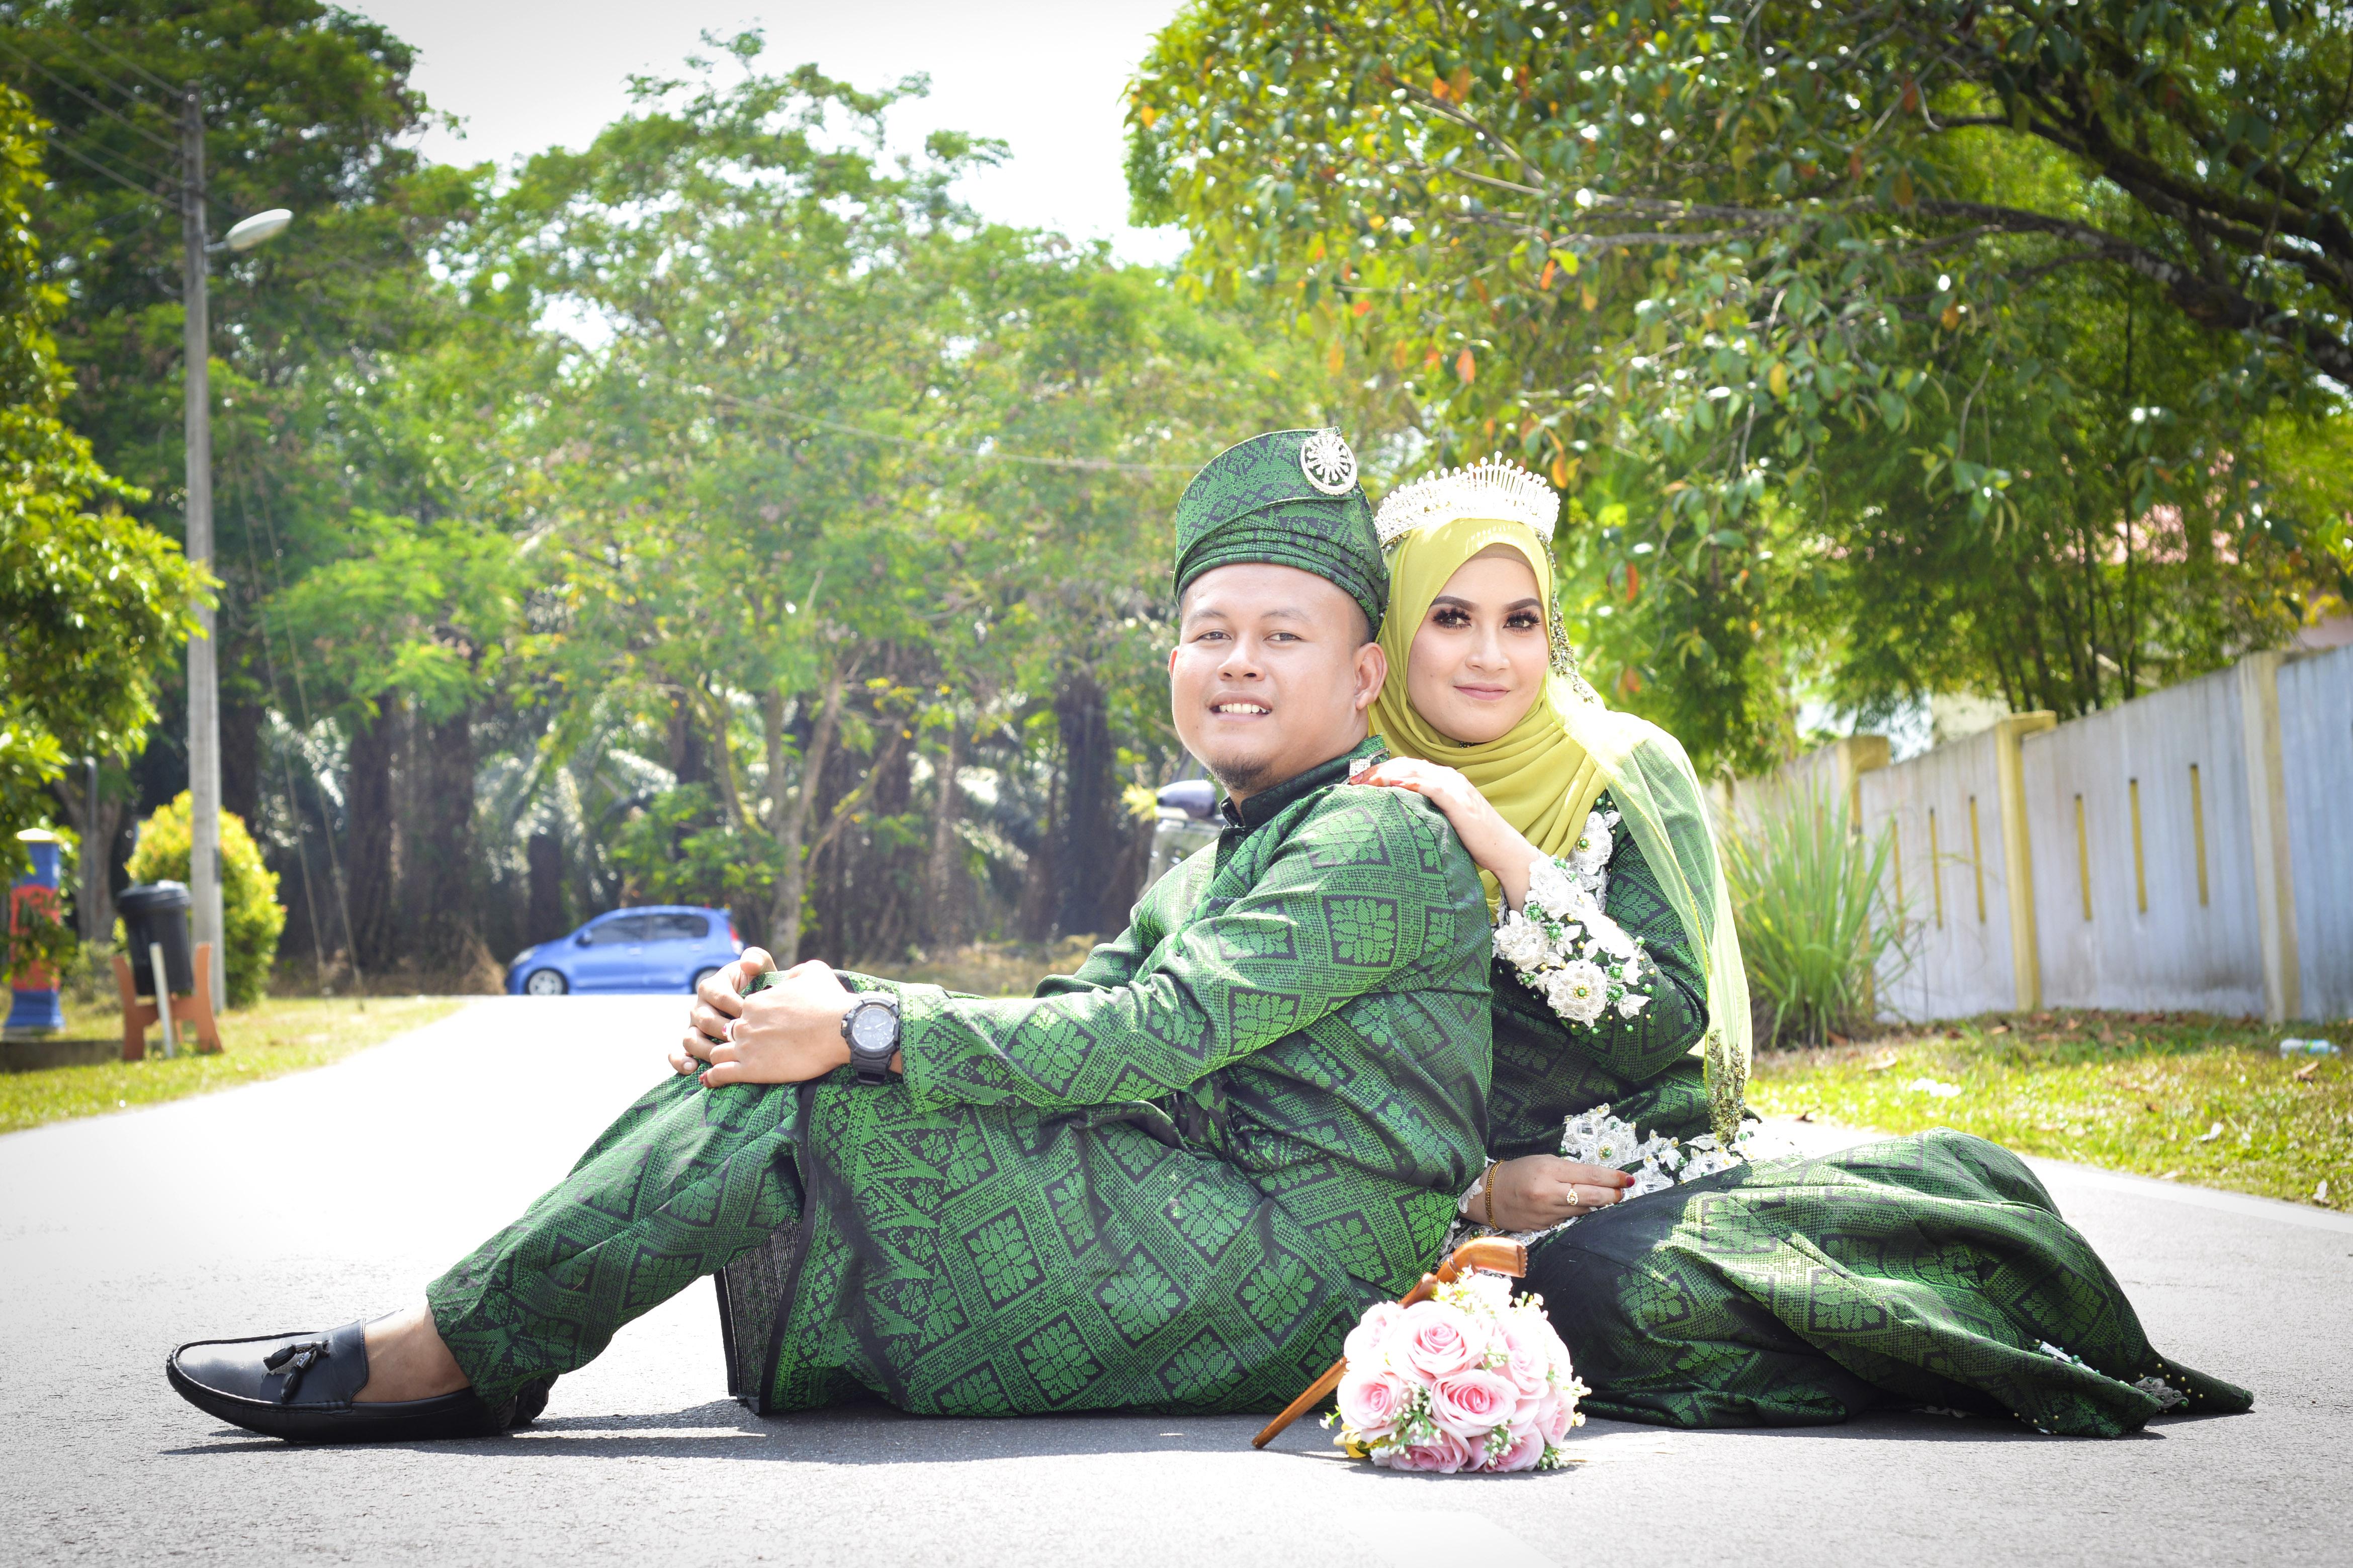 Kenapa baju pengantin lebih cantik berwarna hijau – Chentamanis